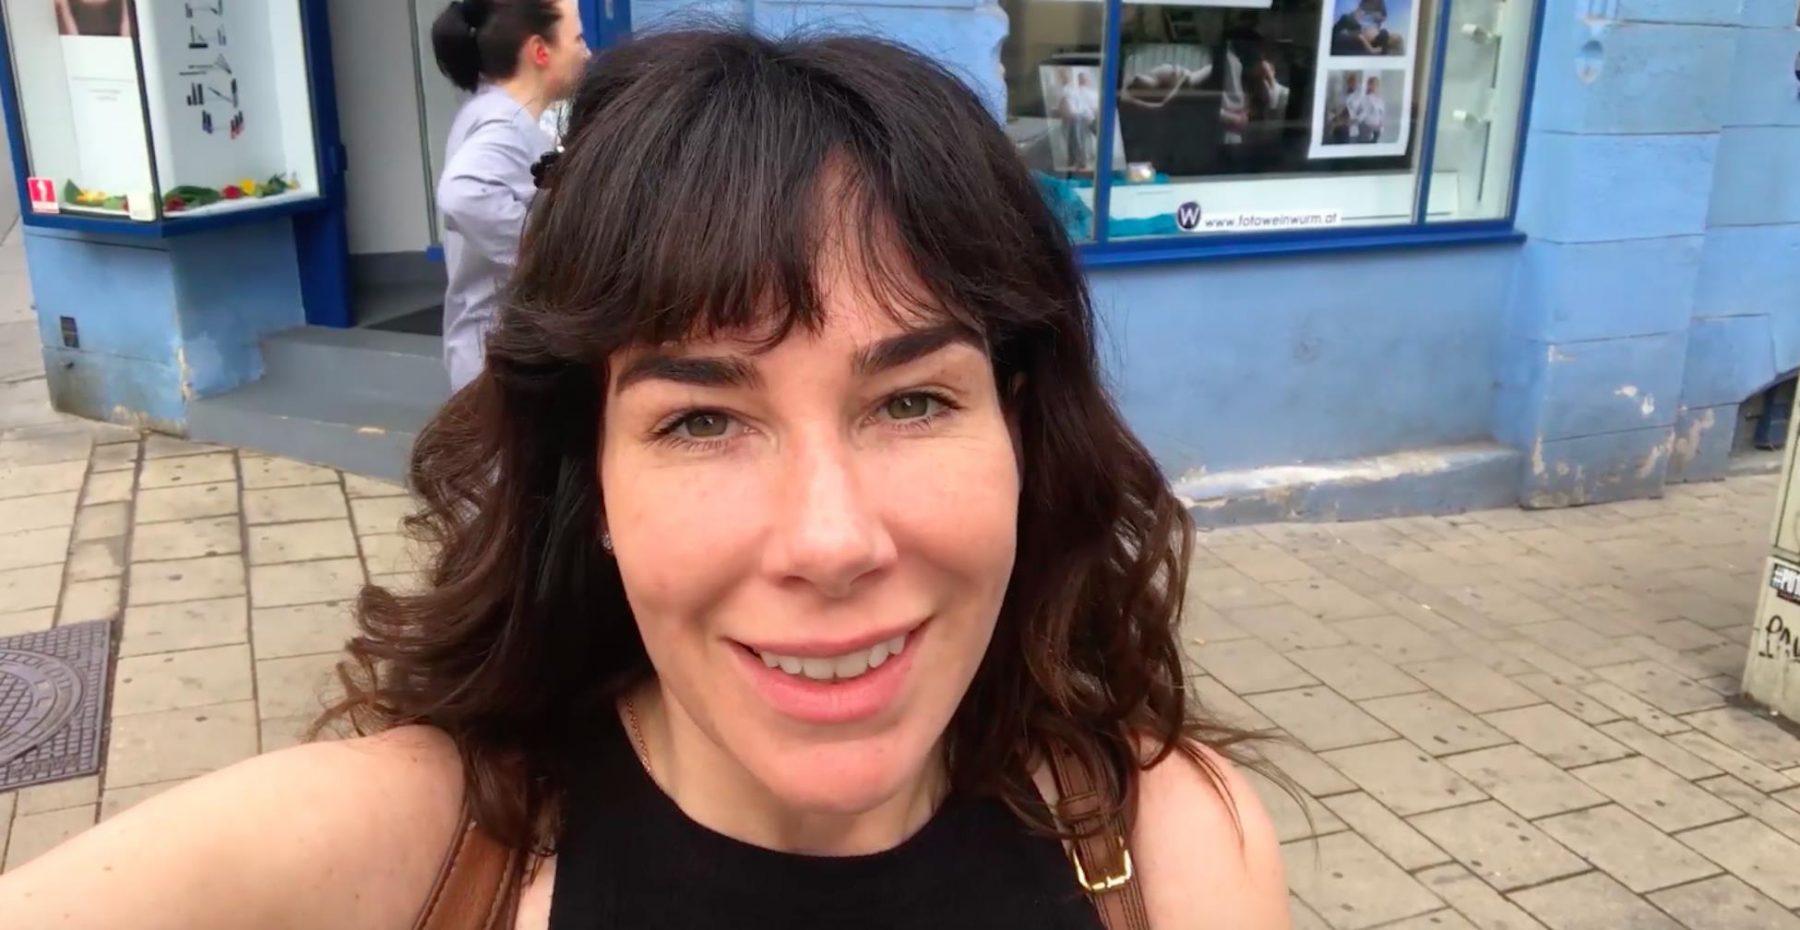 Afl. 10 Wenen, Taipei én Amsterdam in minder dan één week: Halina doet 't